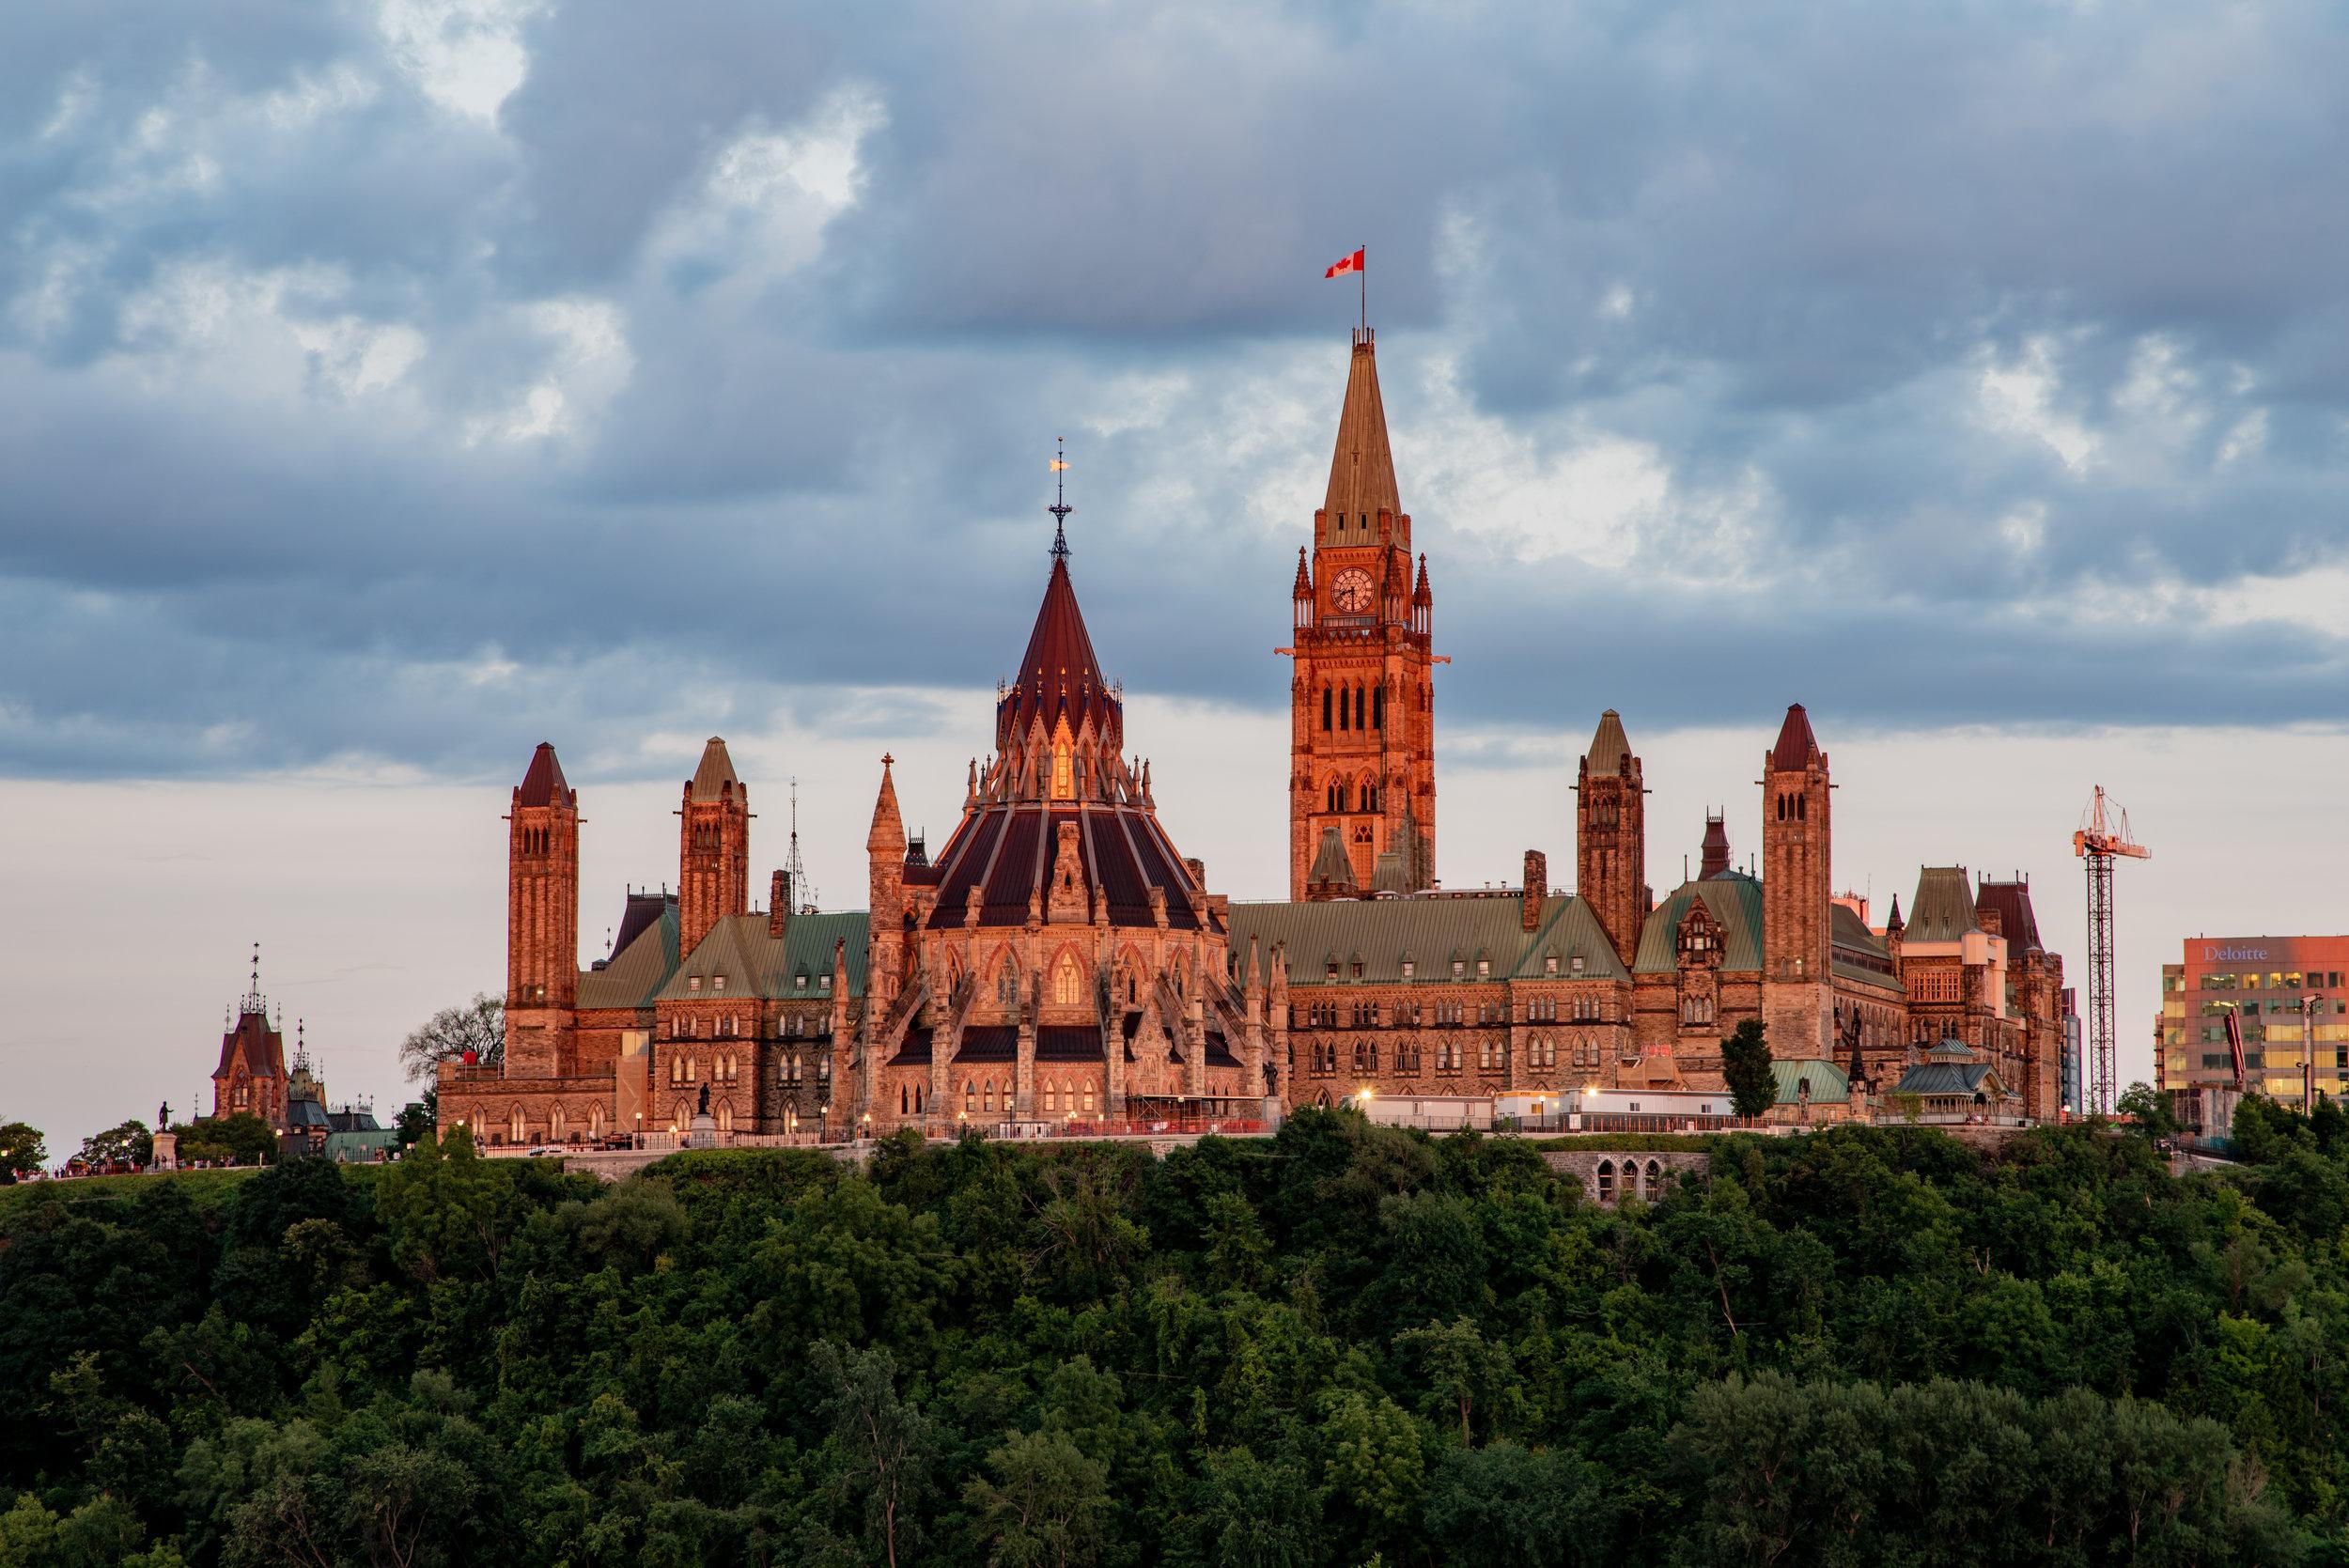 Ottawa - Canada 1996 - Present